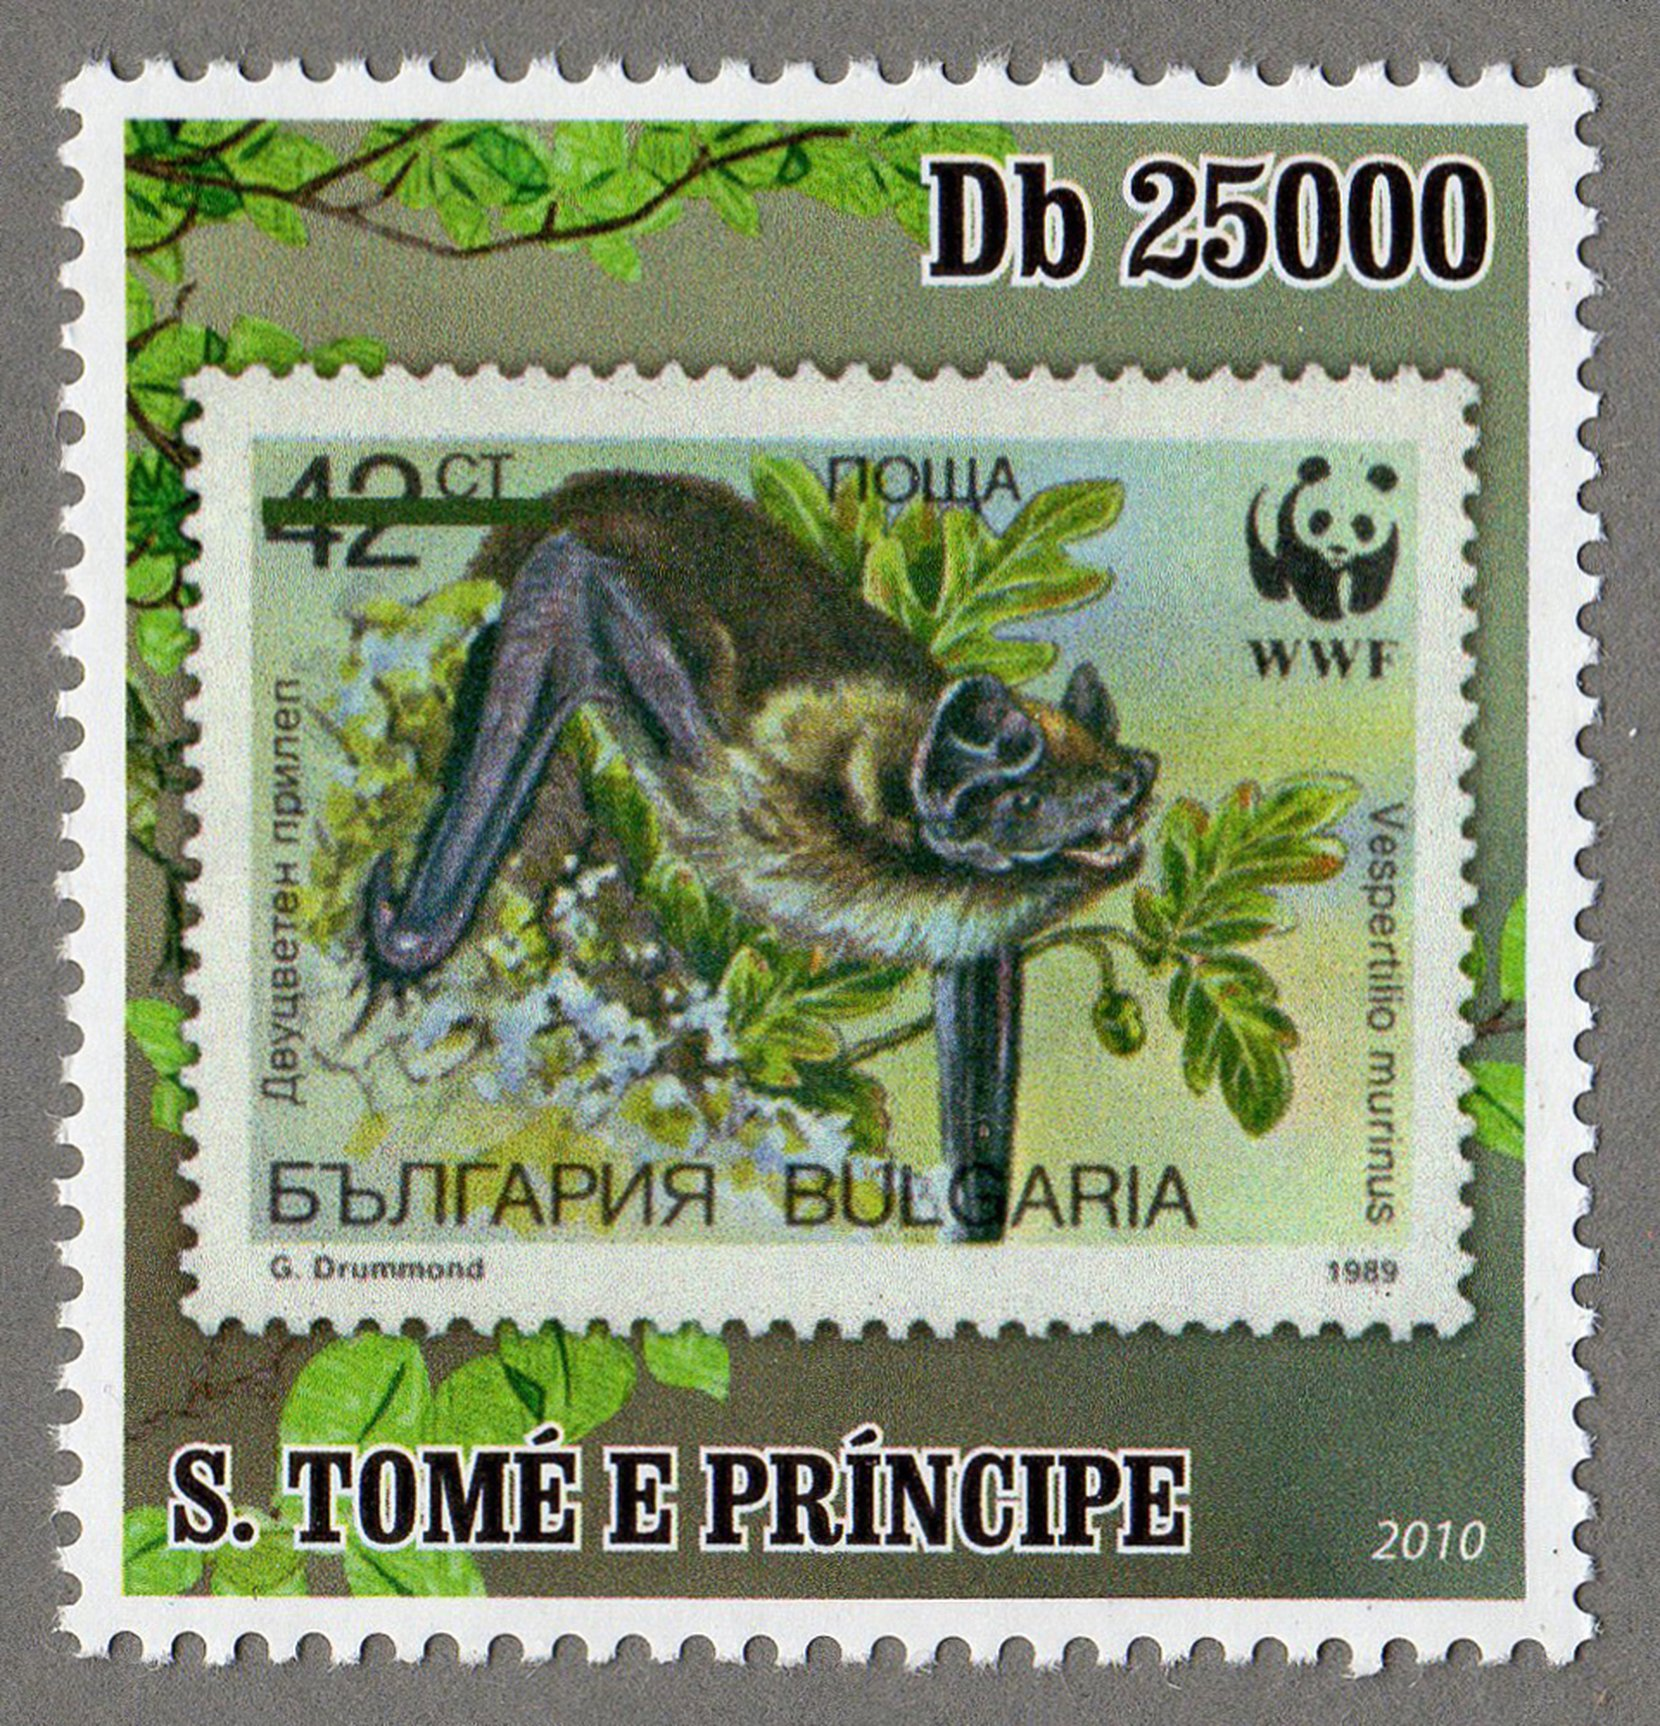 bulgaria – vespertilio murinus s.tome e principe stamp (1) philately postage stamps